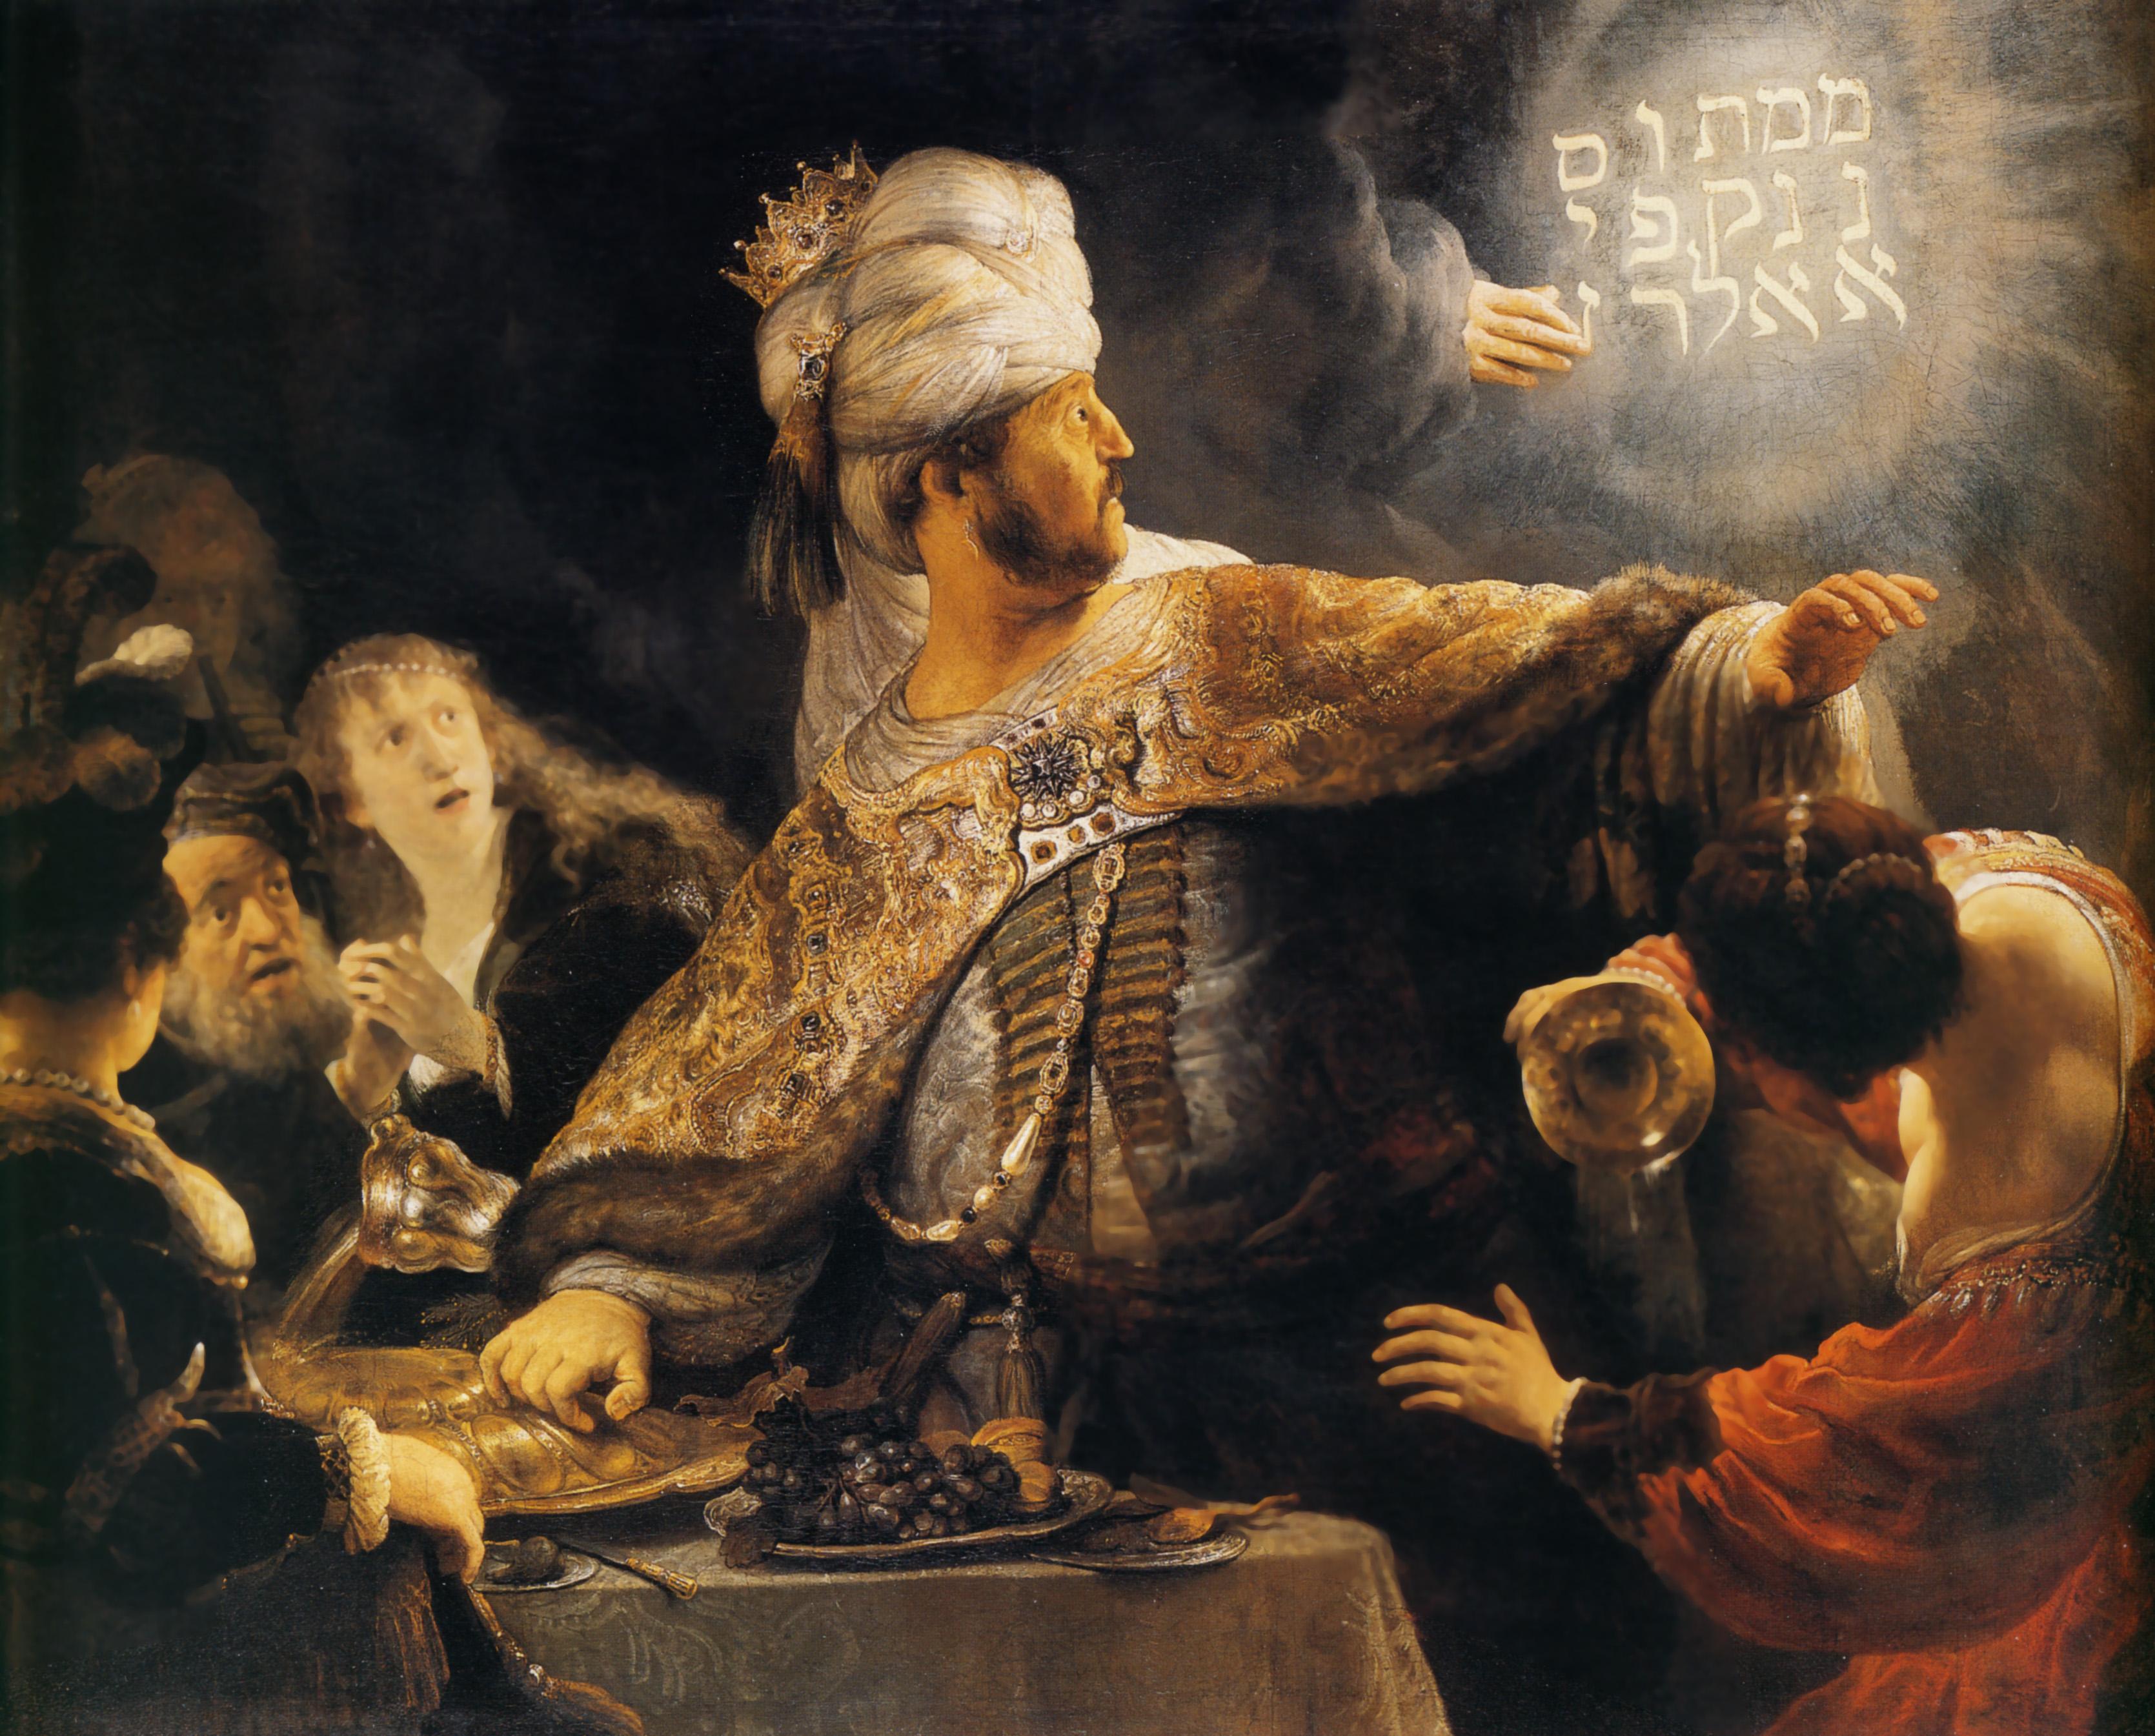 http://cp12.nevsepic.com.ua/71/1352766662-1635-rembrandt-le-festin-de-balthasar-the-feast-of-balthasar-hst-1675x209-cm-lng.jpg